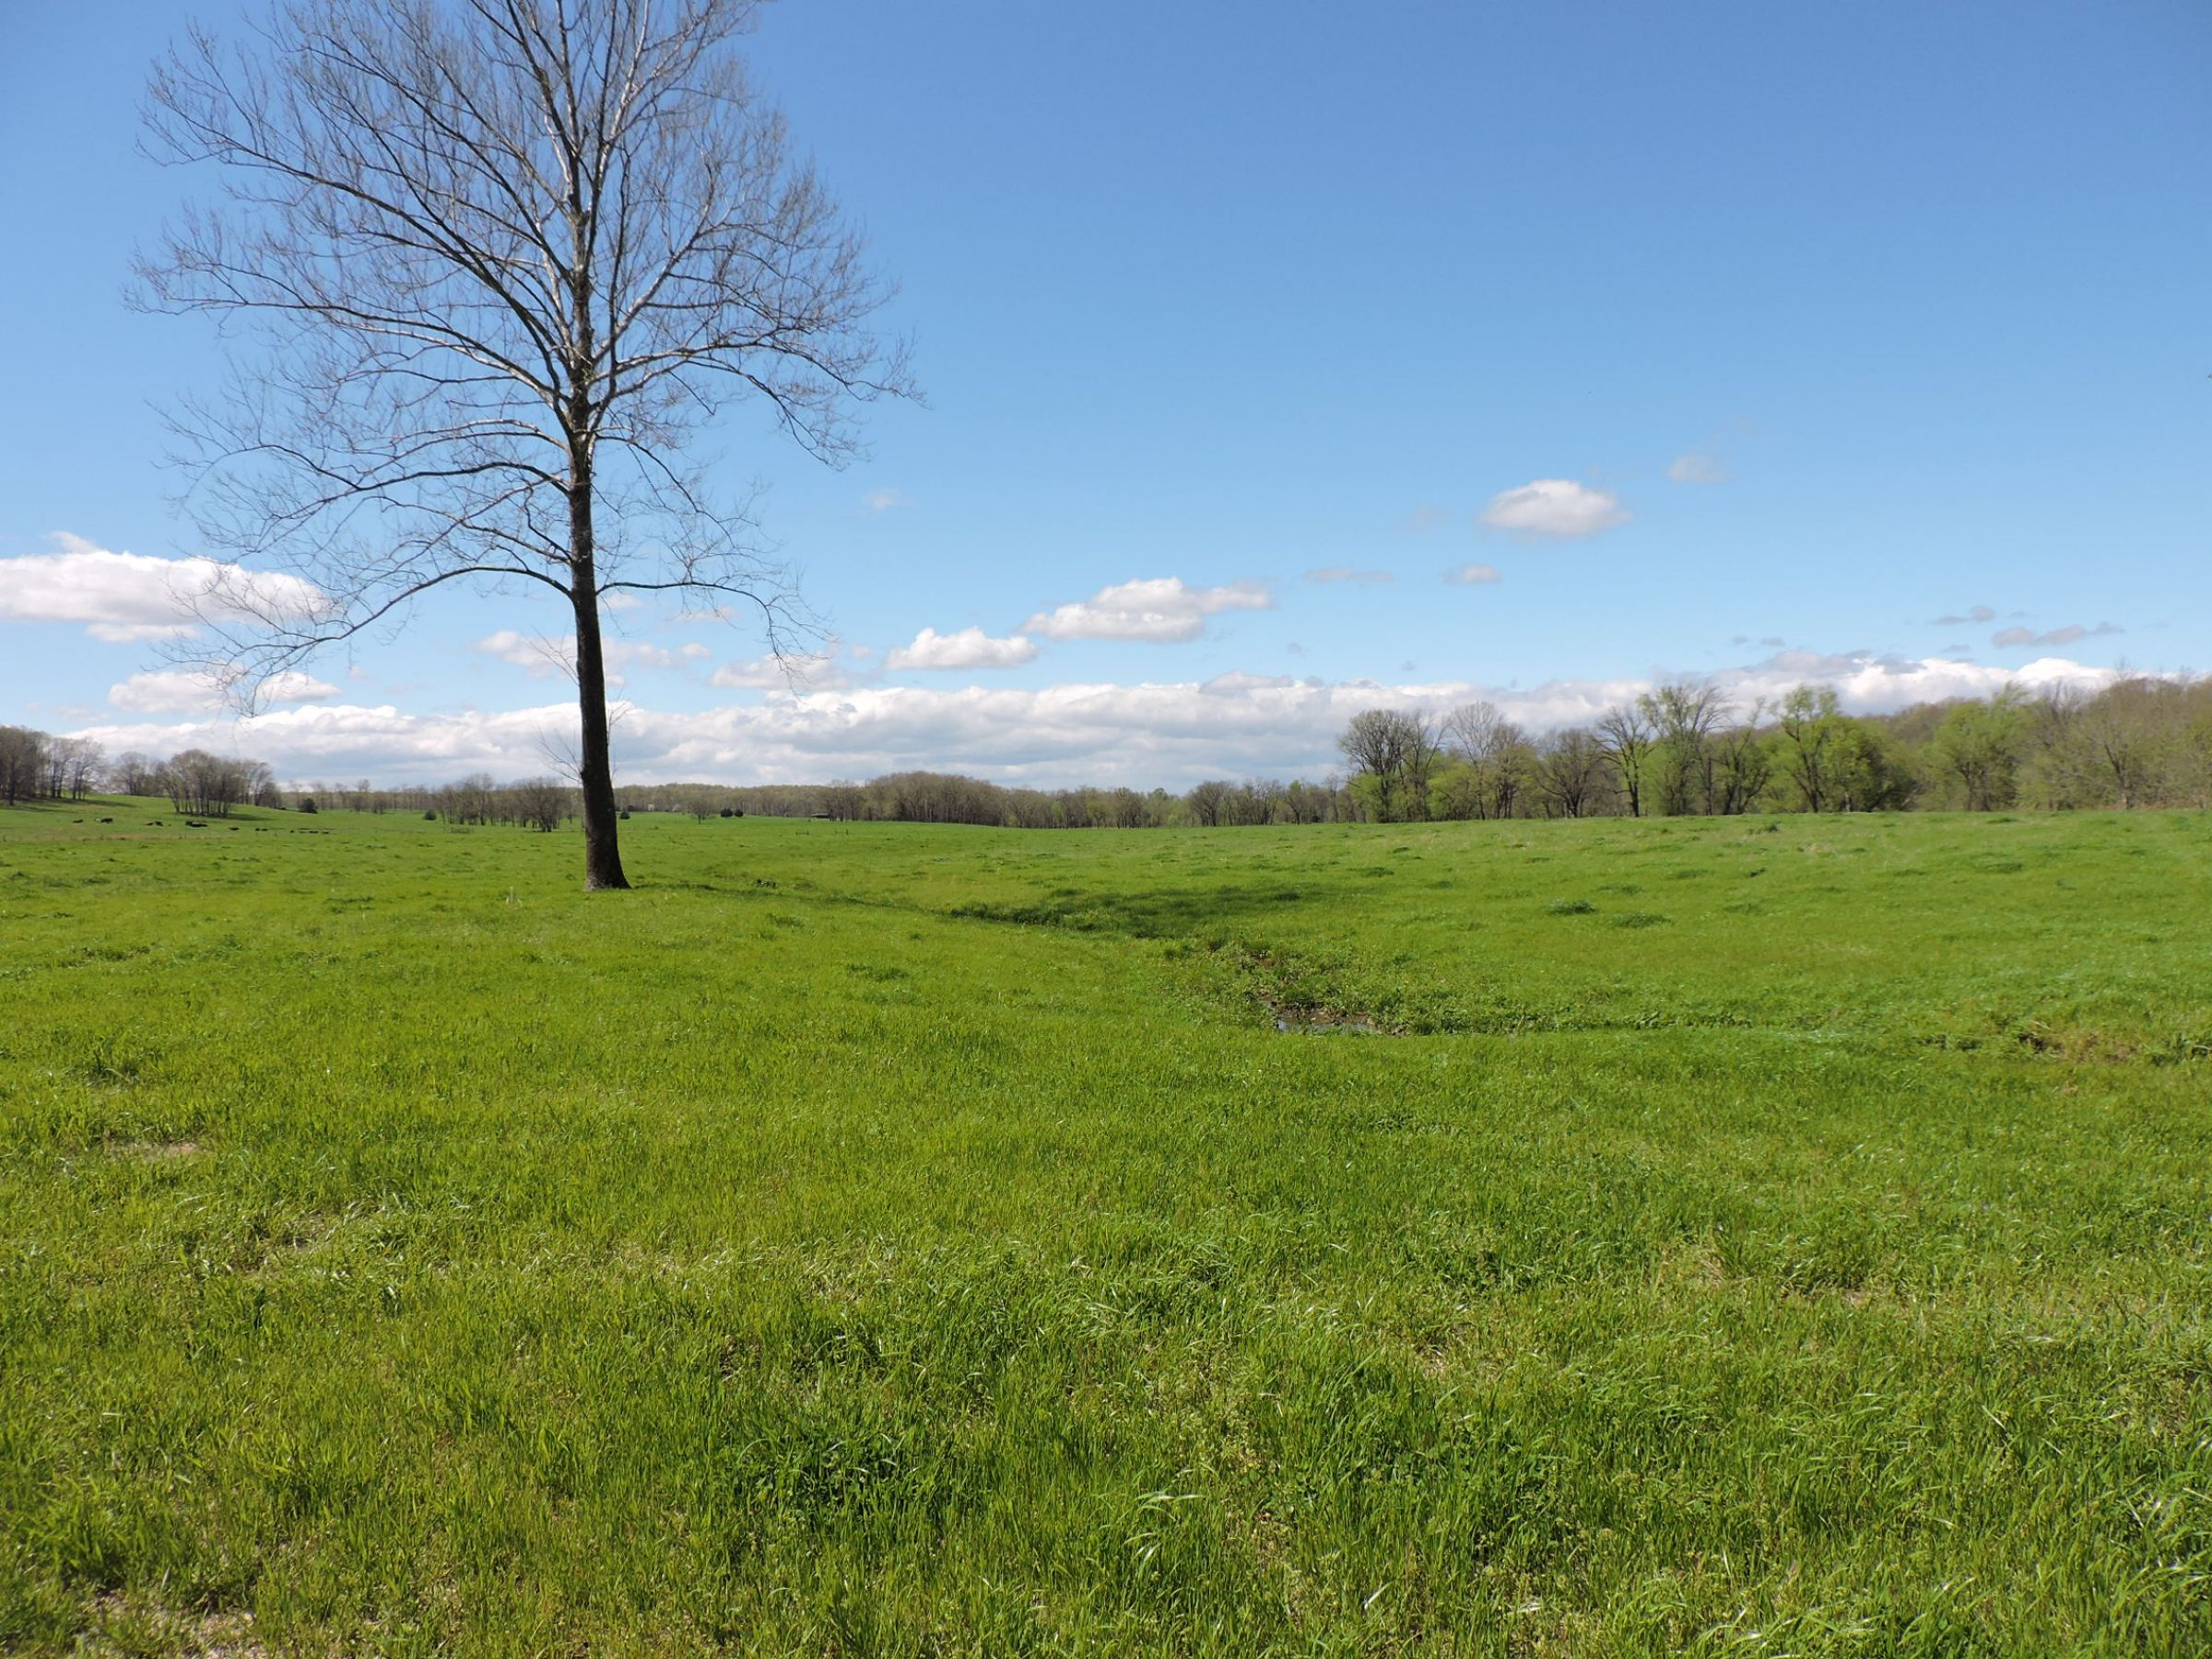 land-sharp-county-arkansas-695-acres-listing-number-15405-15-2021-04-13-213615.JPG